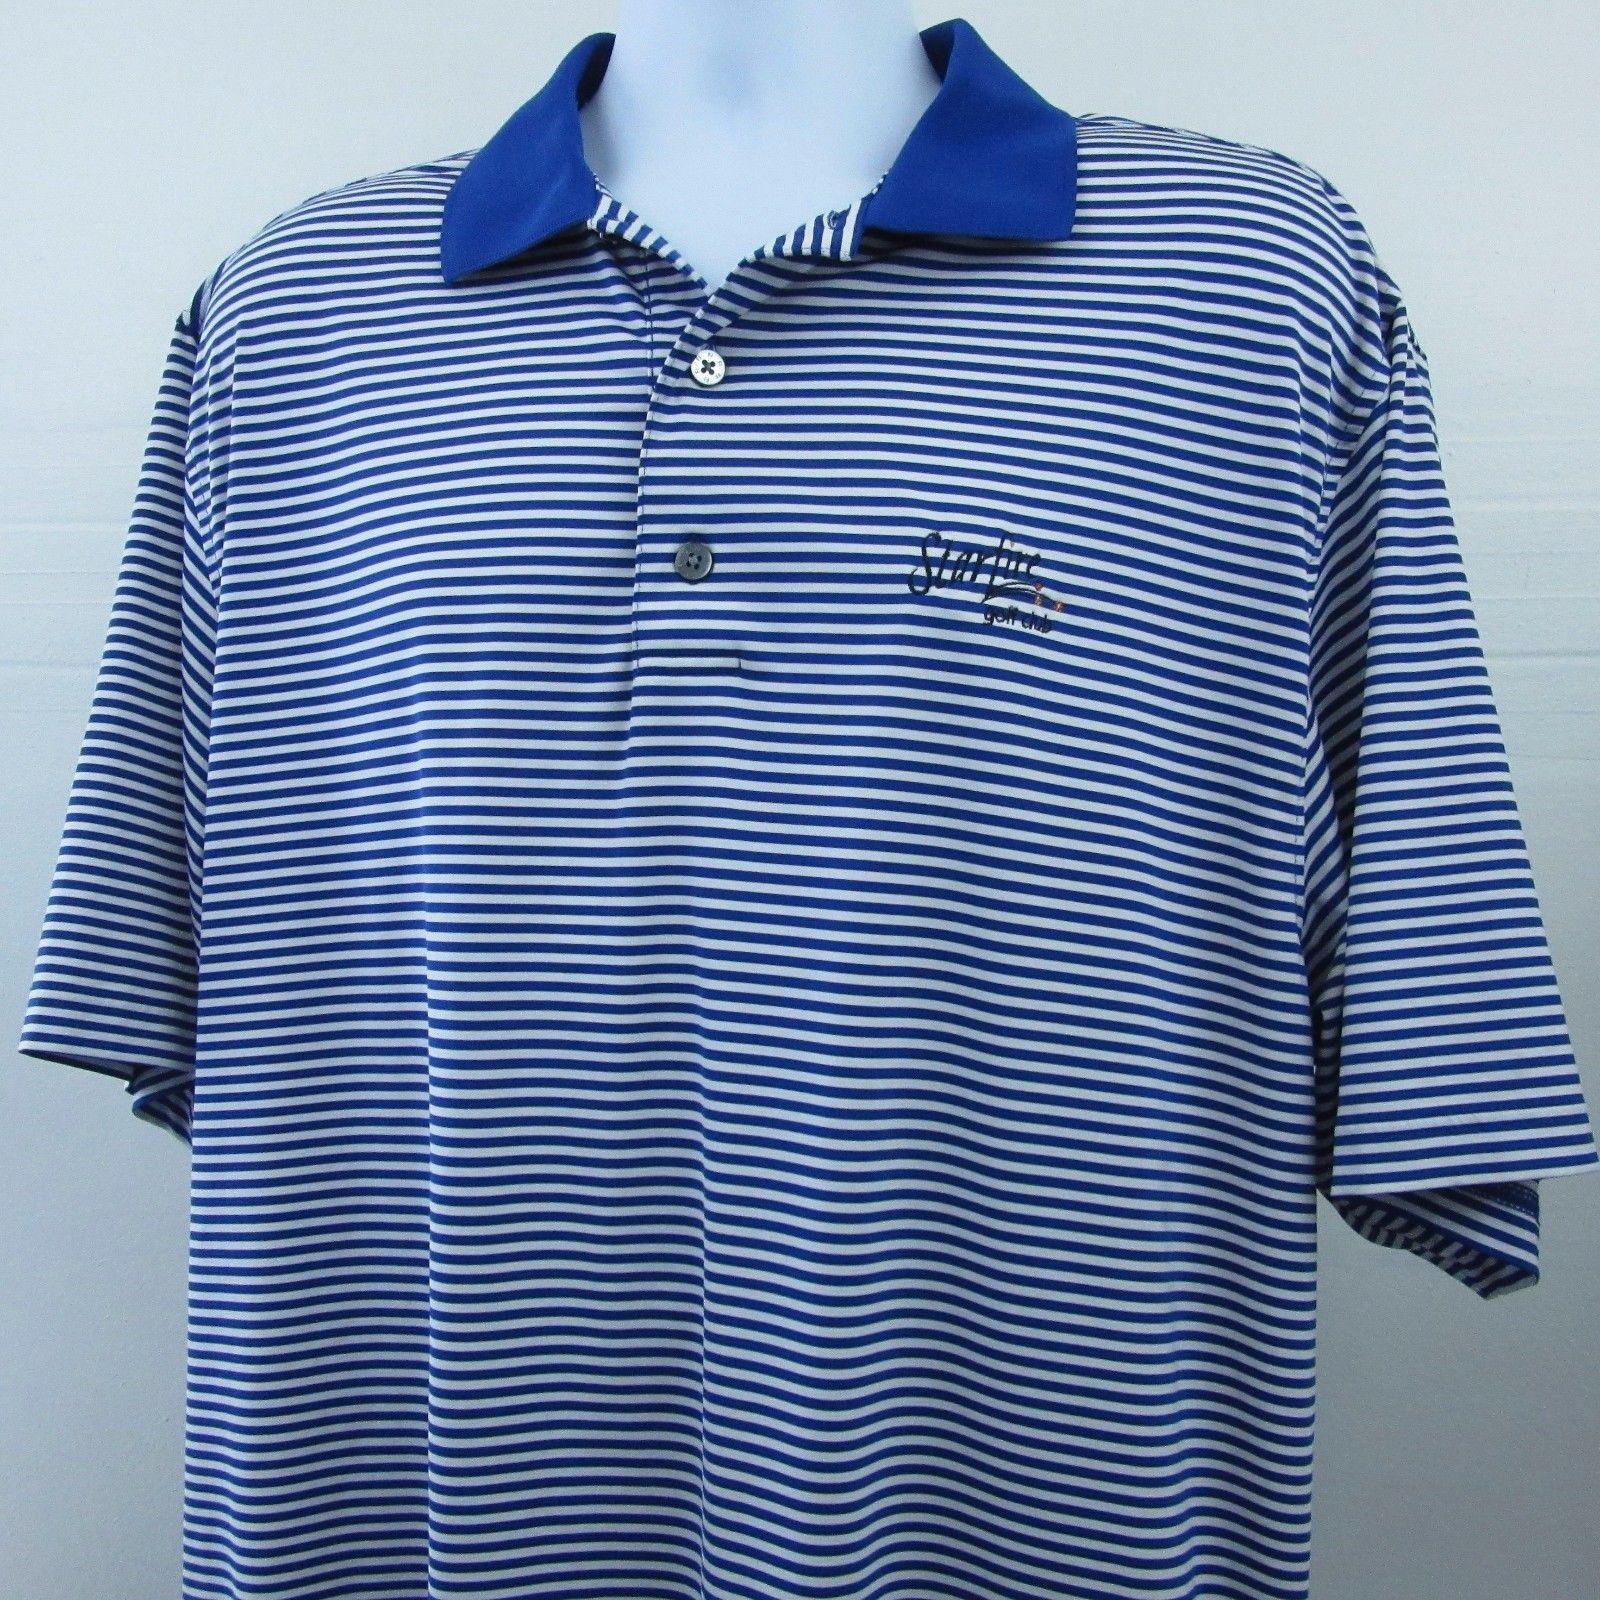 Footjoy starfire club logo fj mens large blue white for Footjoy shirts with titleist logo